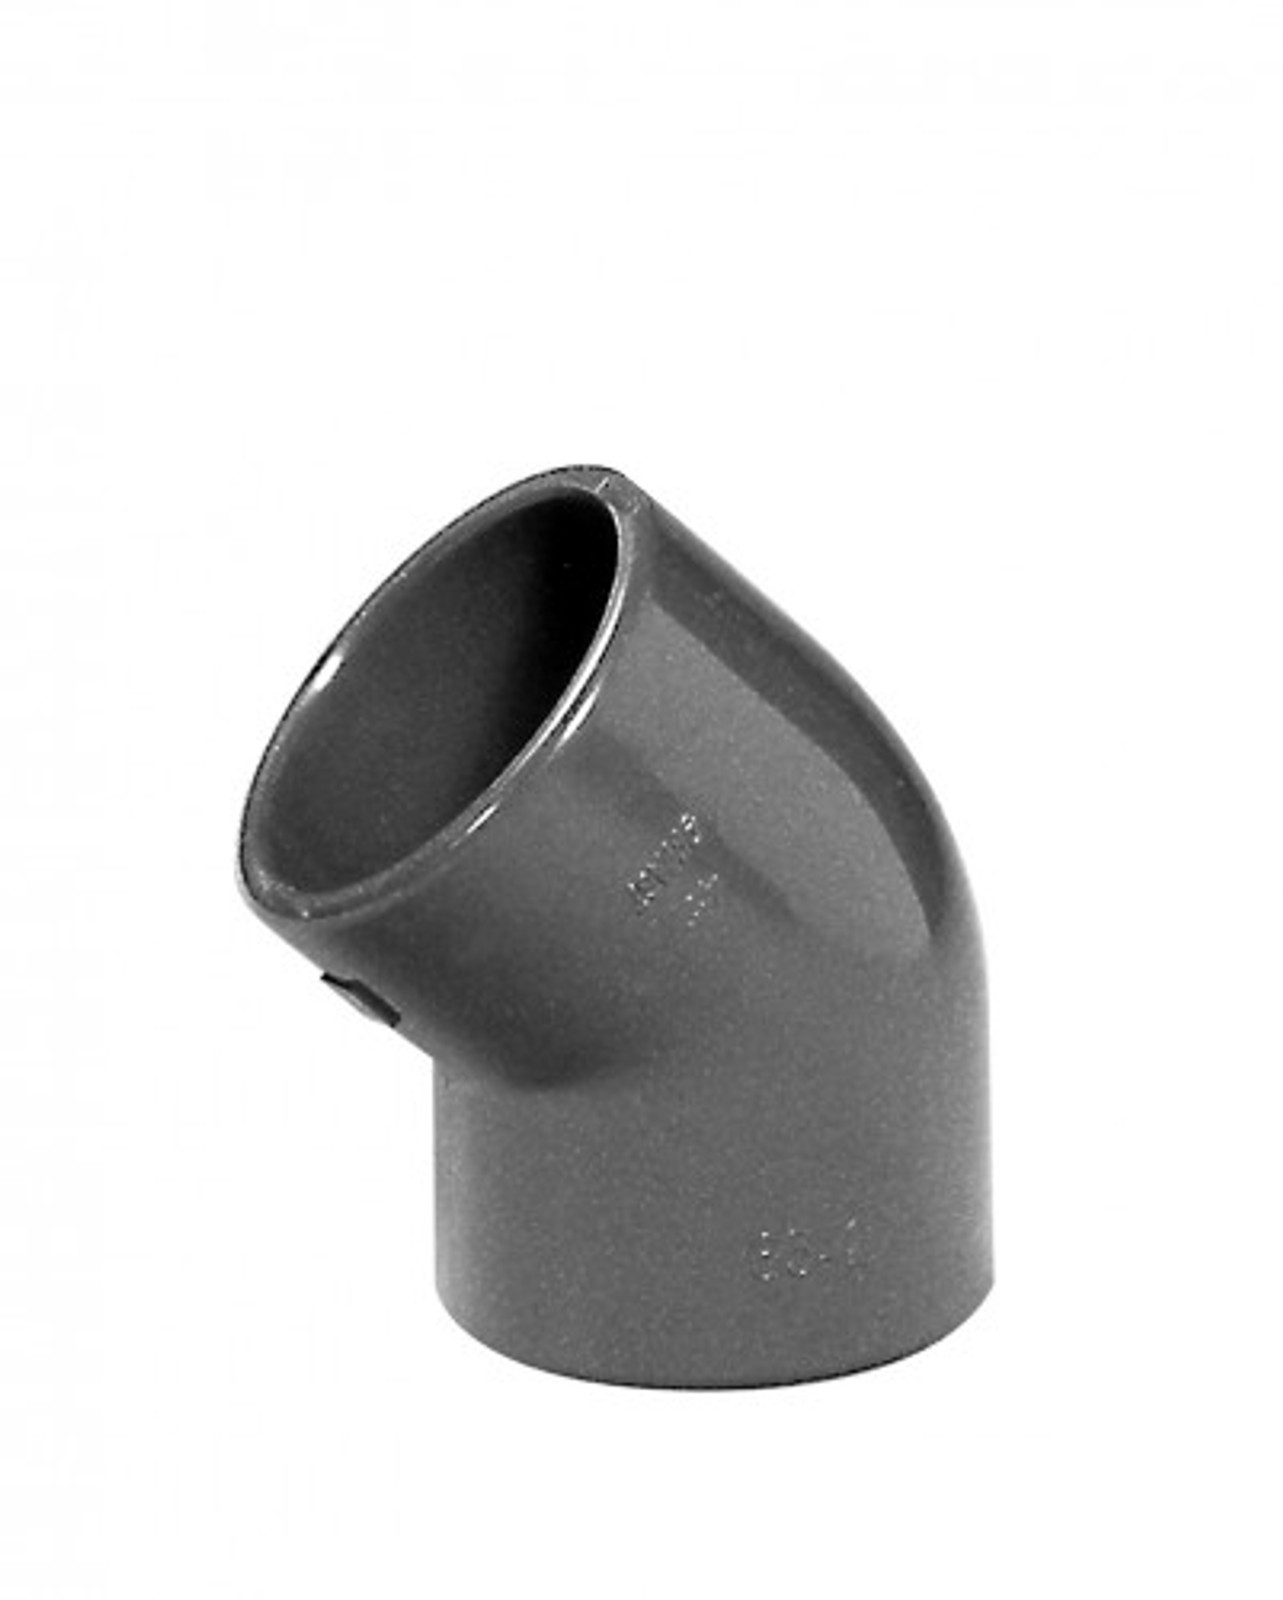 Winkel 45°, 63 mm aus PVC